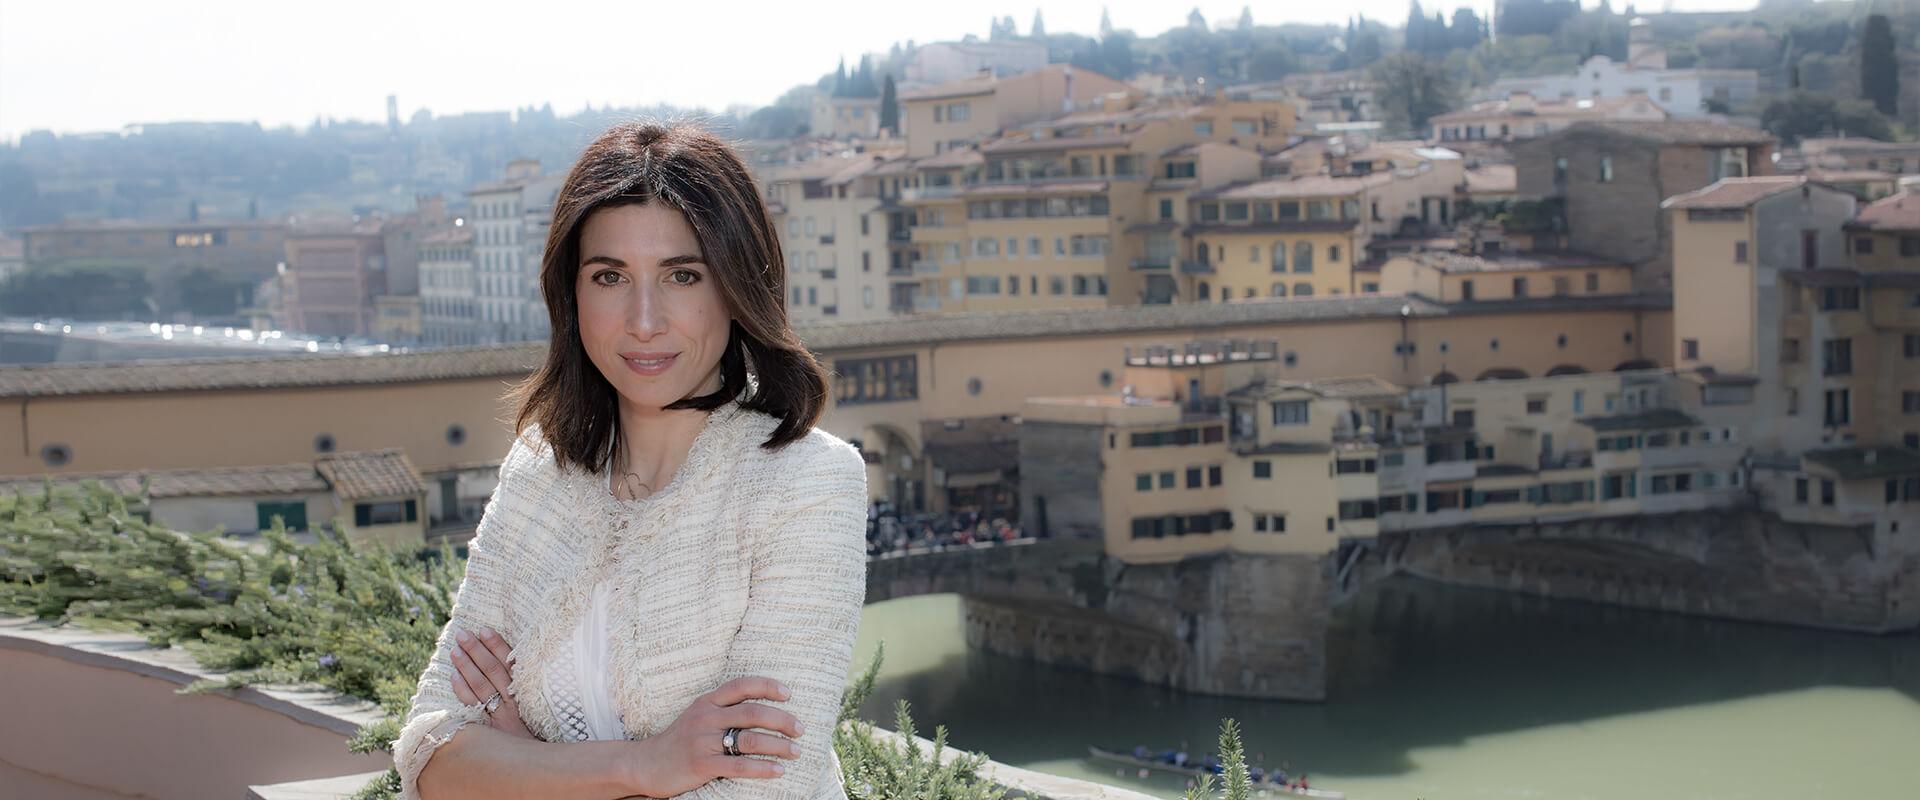 Francesca-Bruni-affitti-firenze-immobili-prestigio